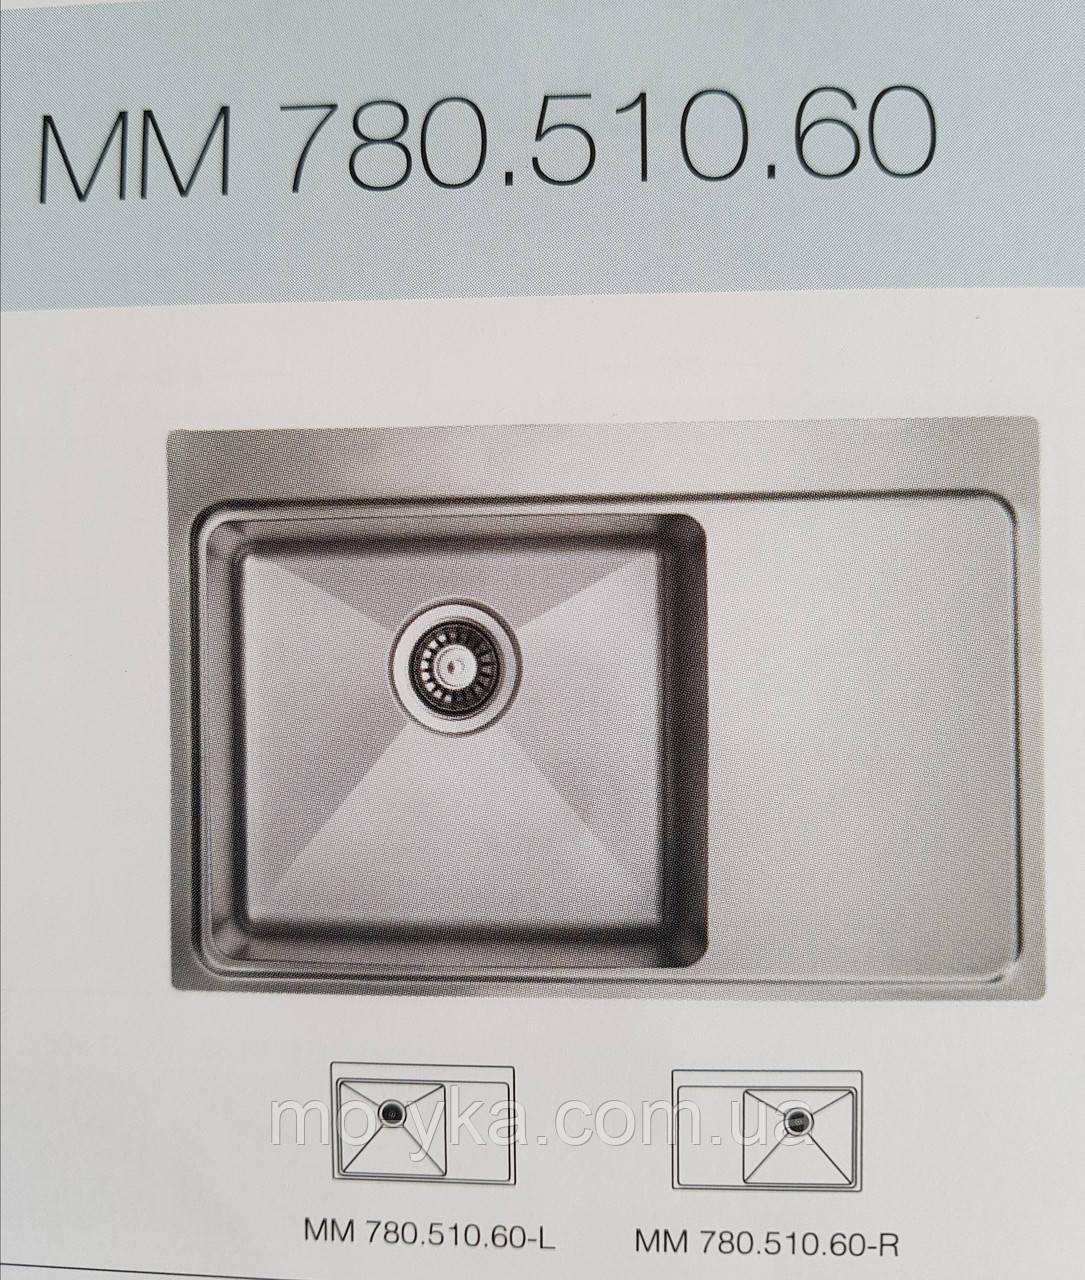 Кухонная мойка Ukinox Micro MMP780.510.60 L